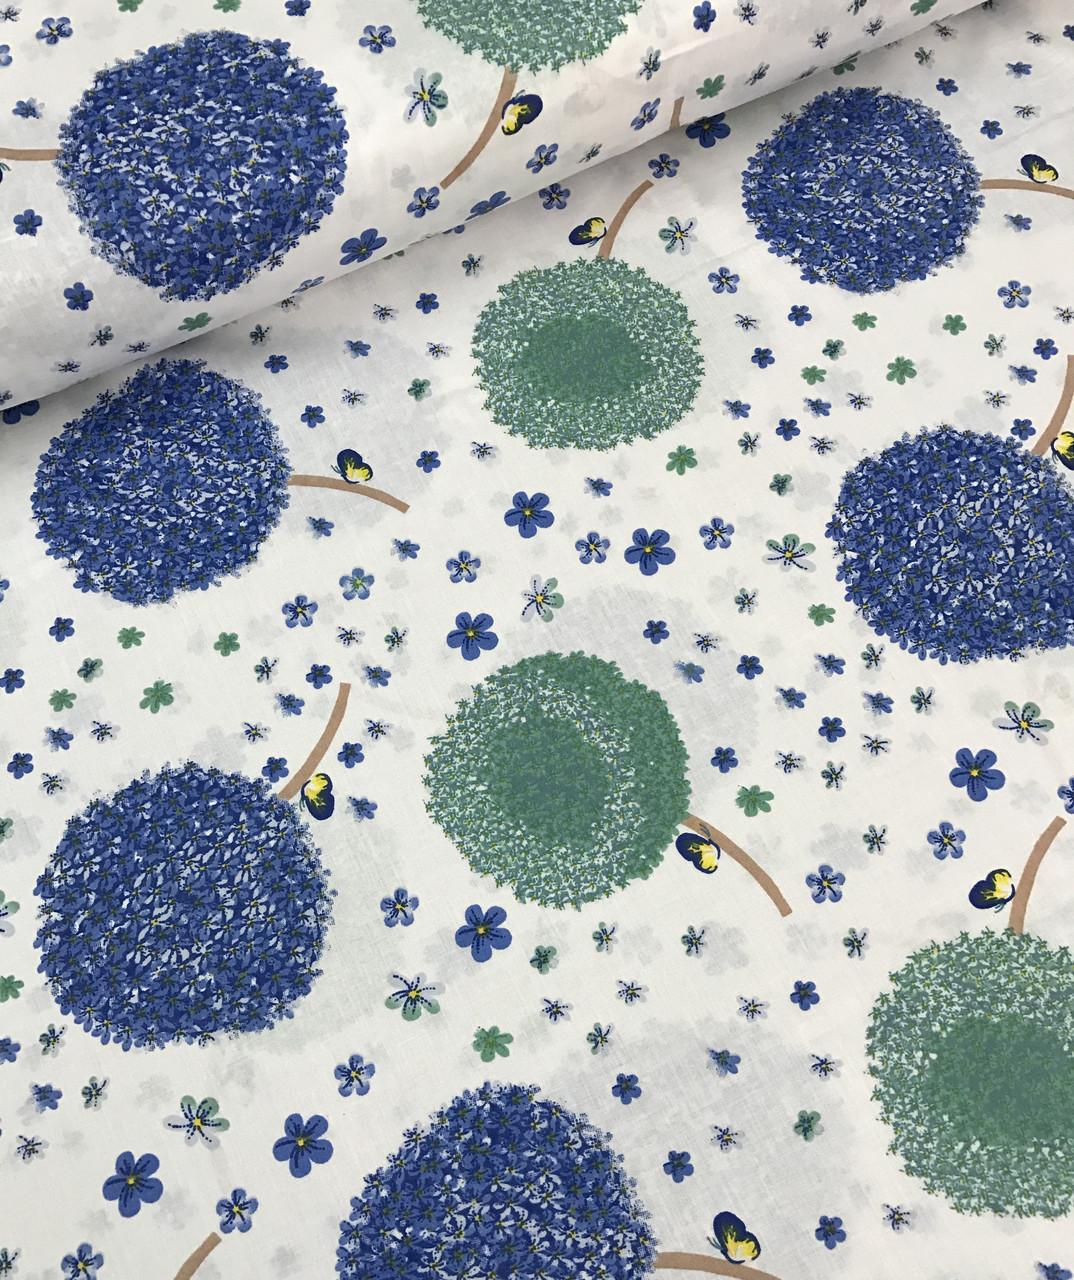 Бавовняна тканина польська кульбаби синьо-блакитні